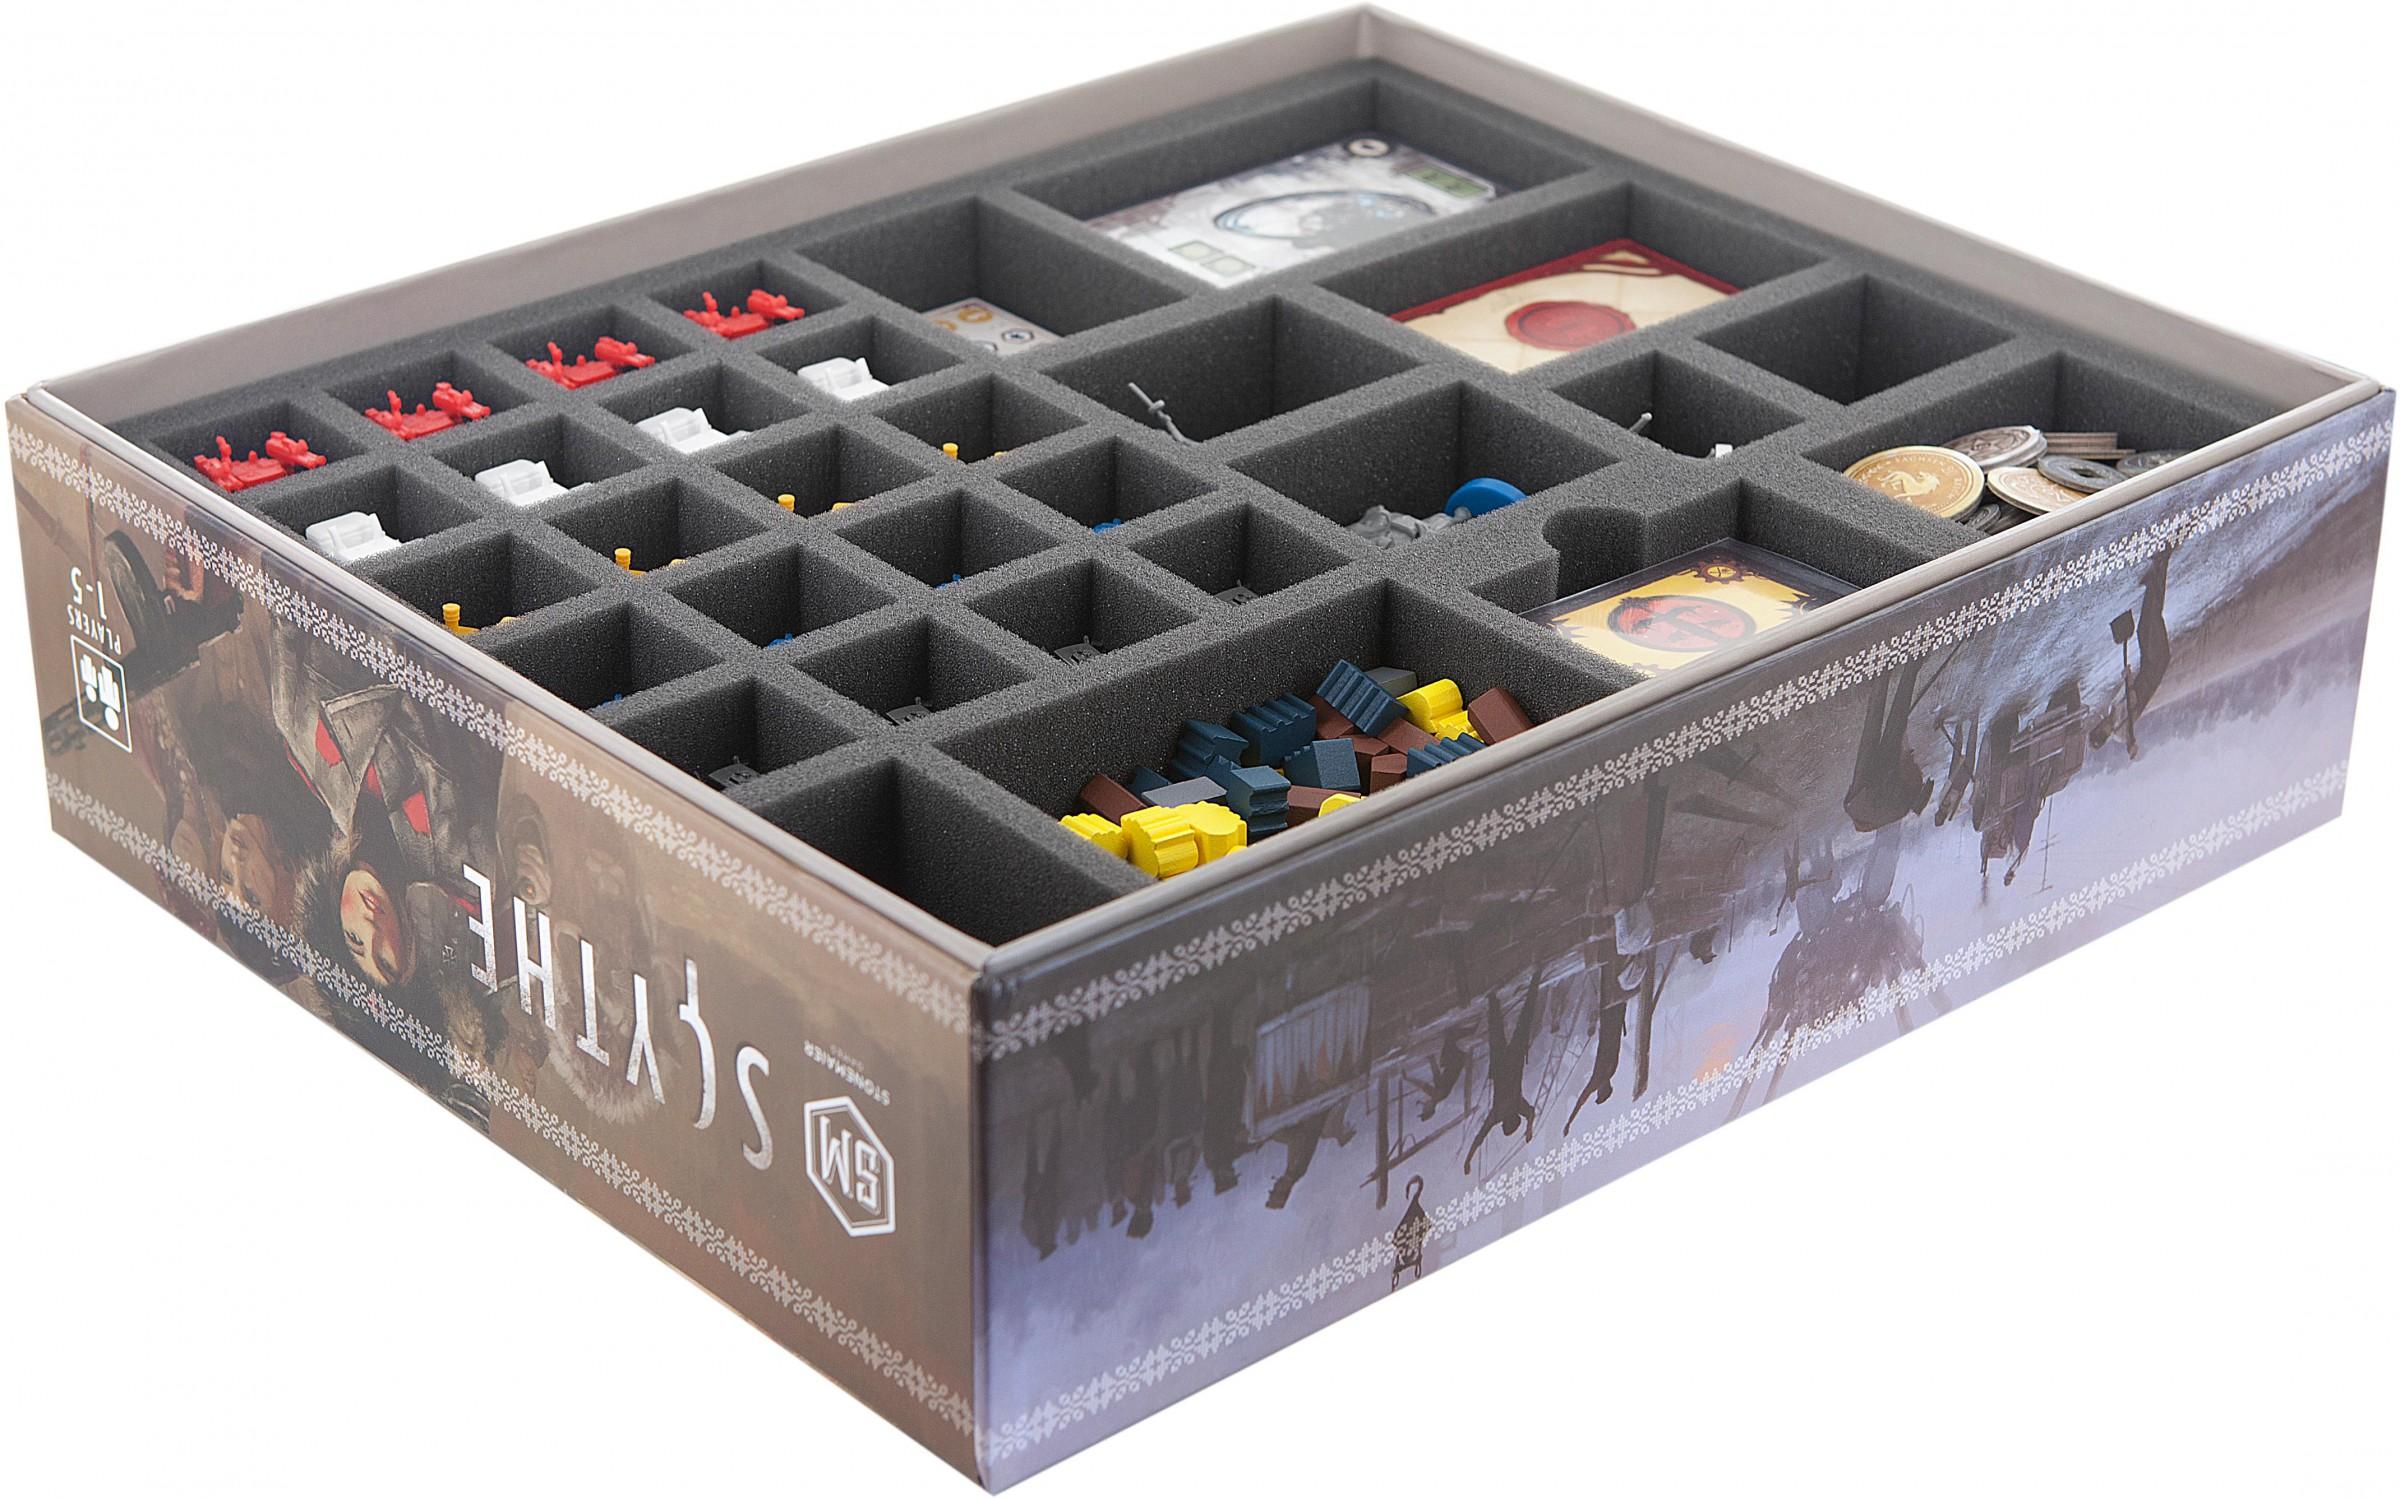 Feldherr Foam tray value set for Fallout board game box